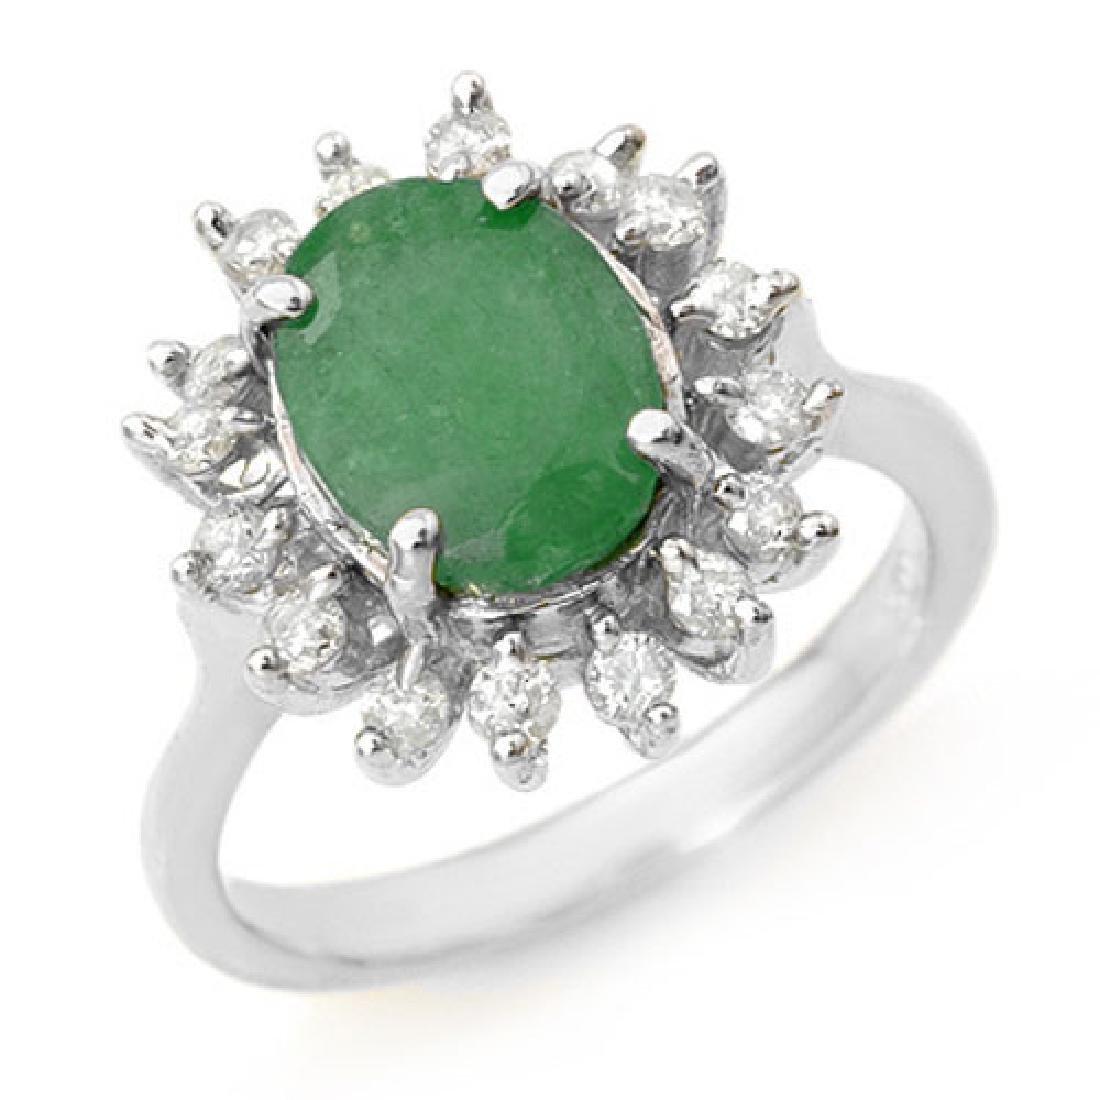 3.10 CTW Emerald & Diamond Ring 10K White Gold